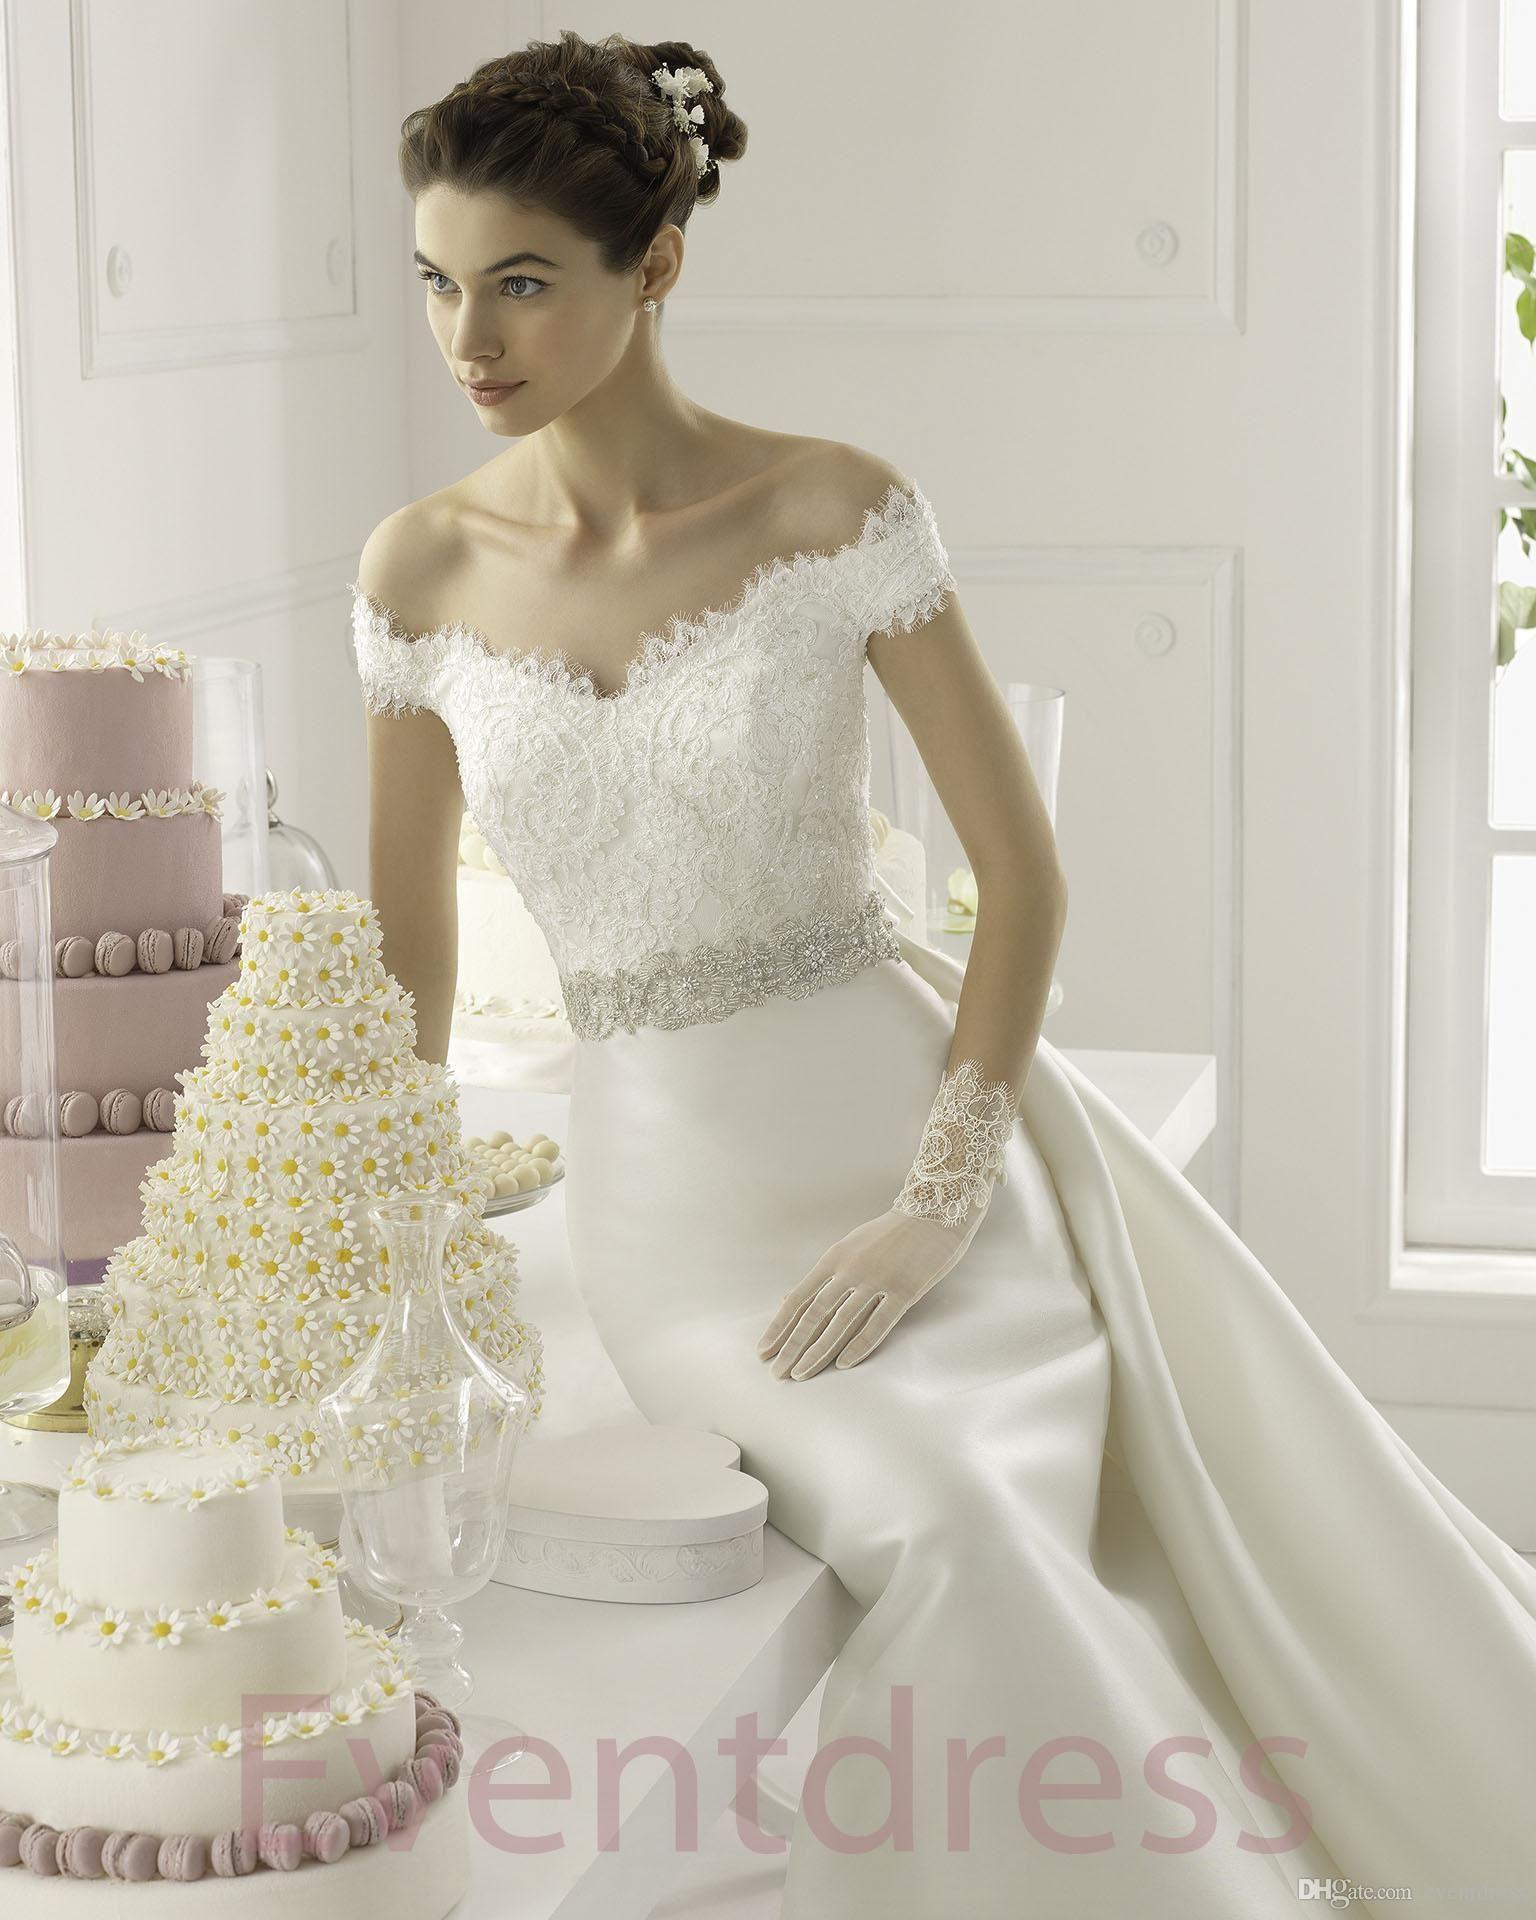 a6ab60c61 2015 A-Line White Satin Wedding Dresses Detachable Train Appliques Beaded  V-neck Sleeveless